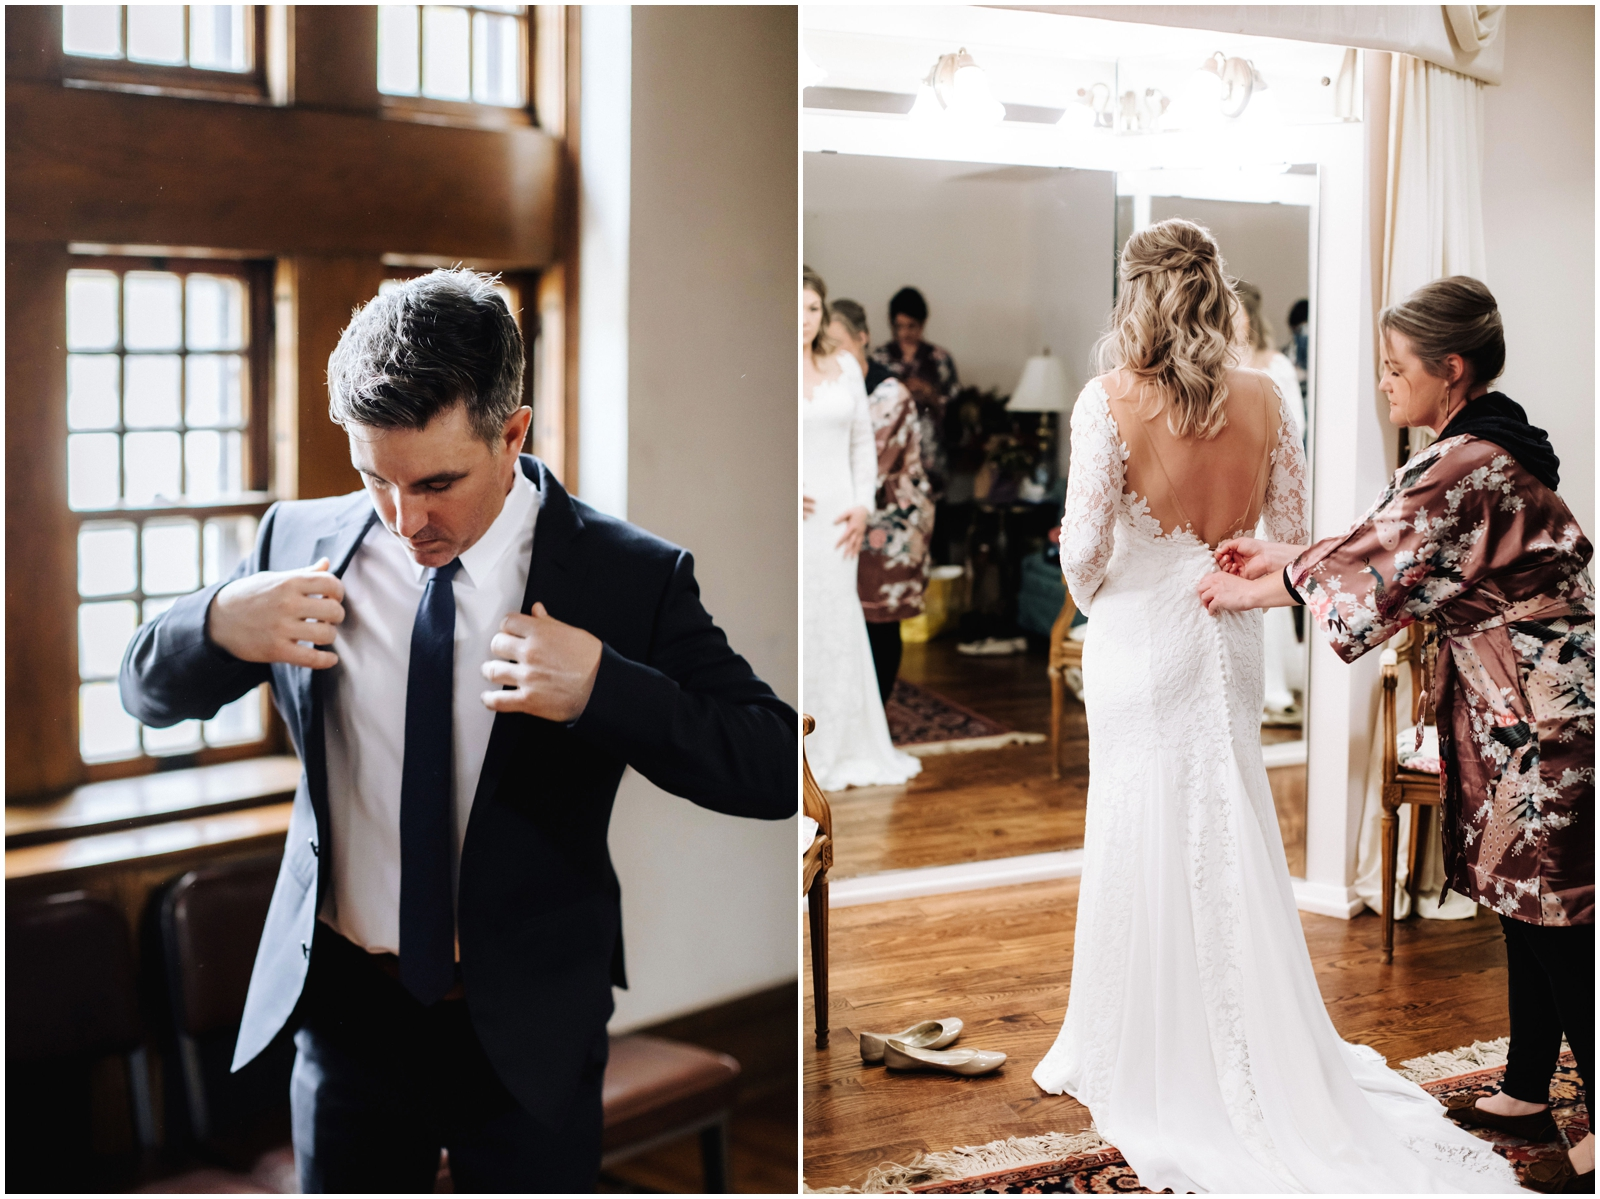 Minnesota Wedding Planner, Mpls Wedding Planner, Machine Shop MPLS, Mpls Wedding Venue . Bride and Groom getting ready for their Minnesota wedding